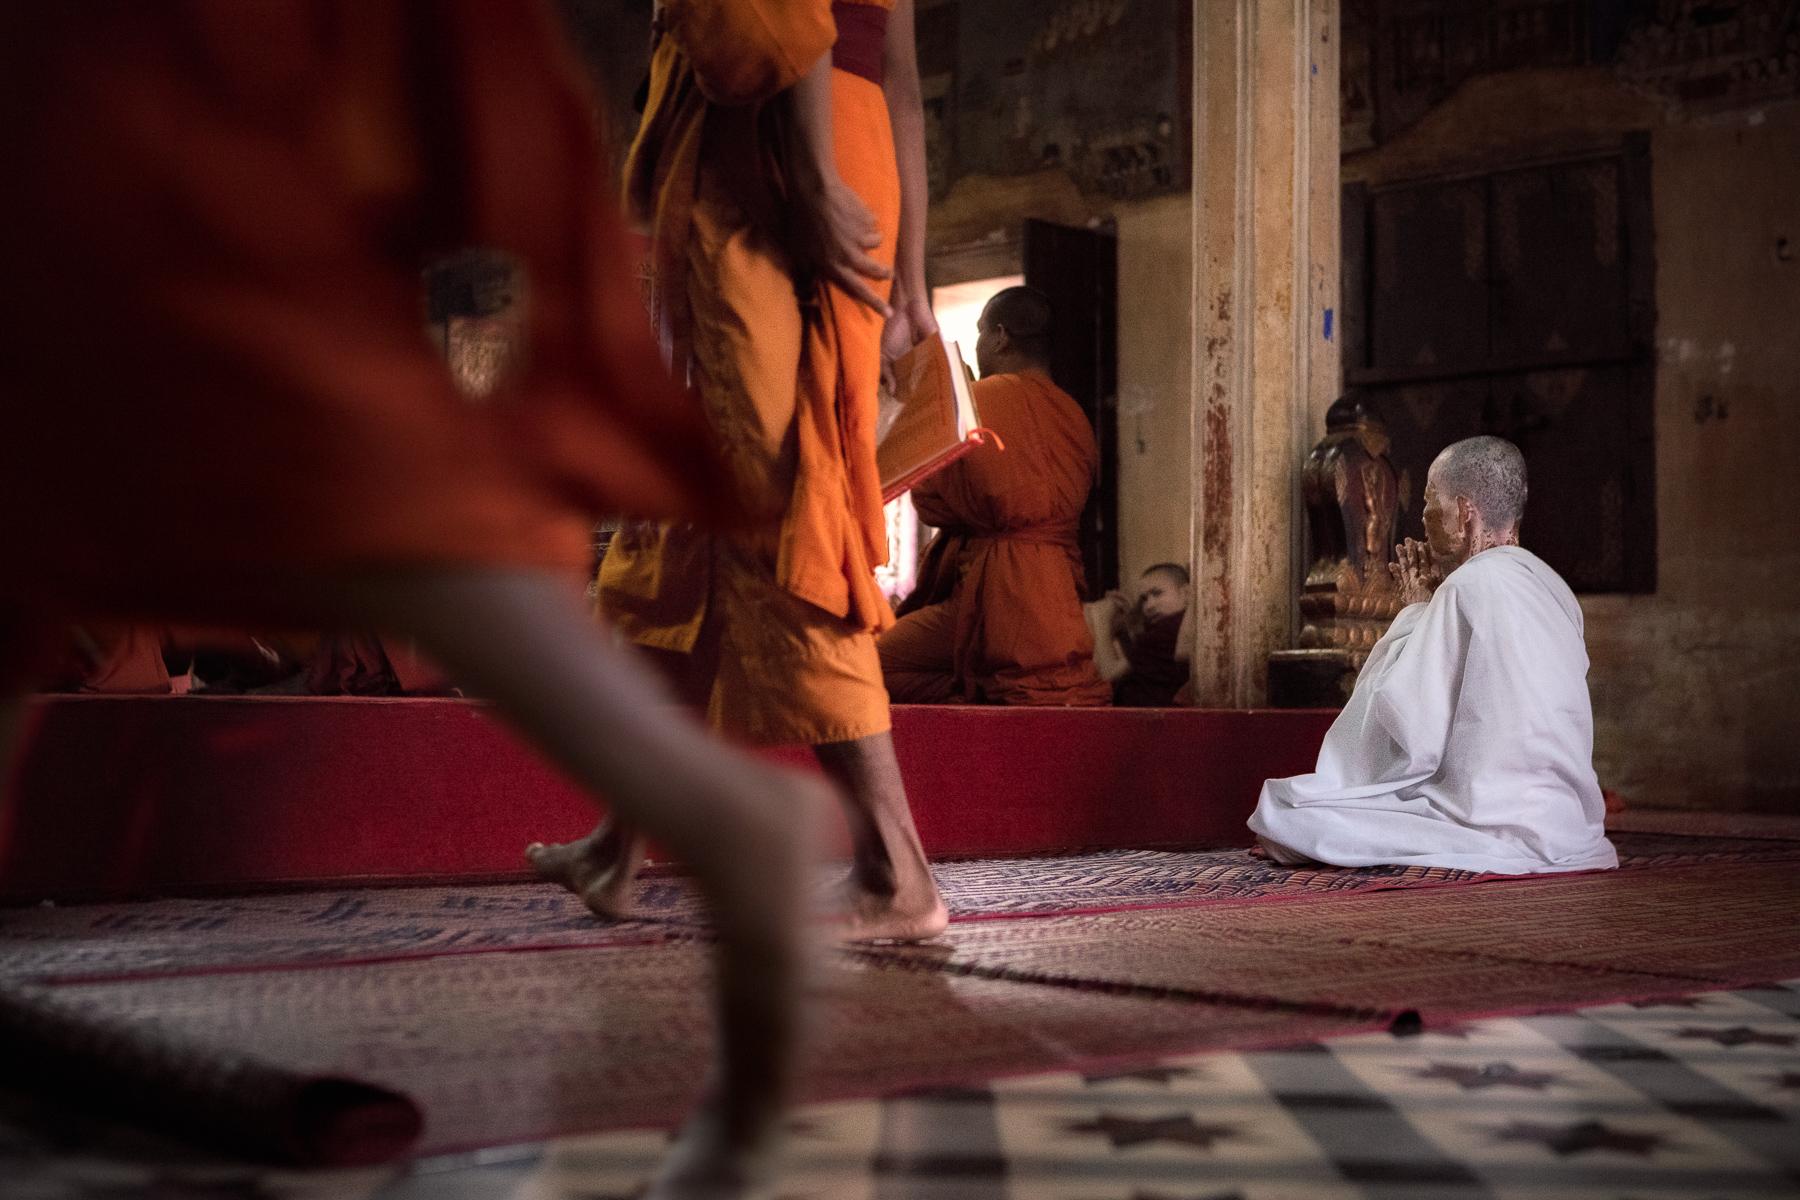 A Buddhist nun at prayer time